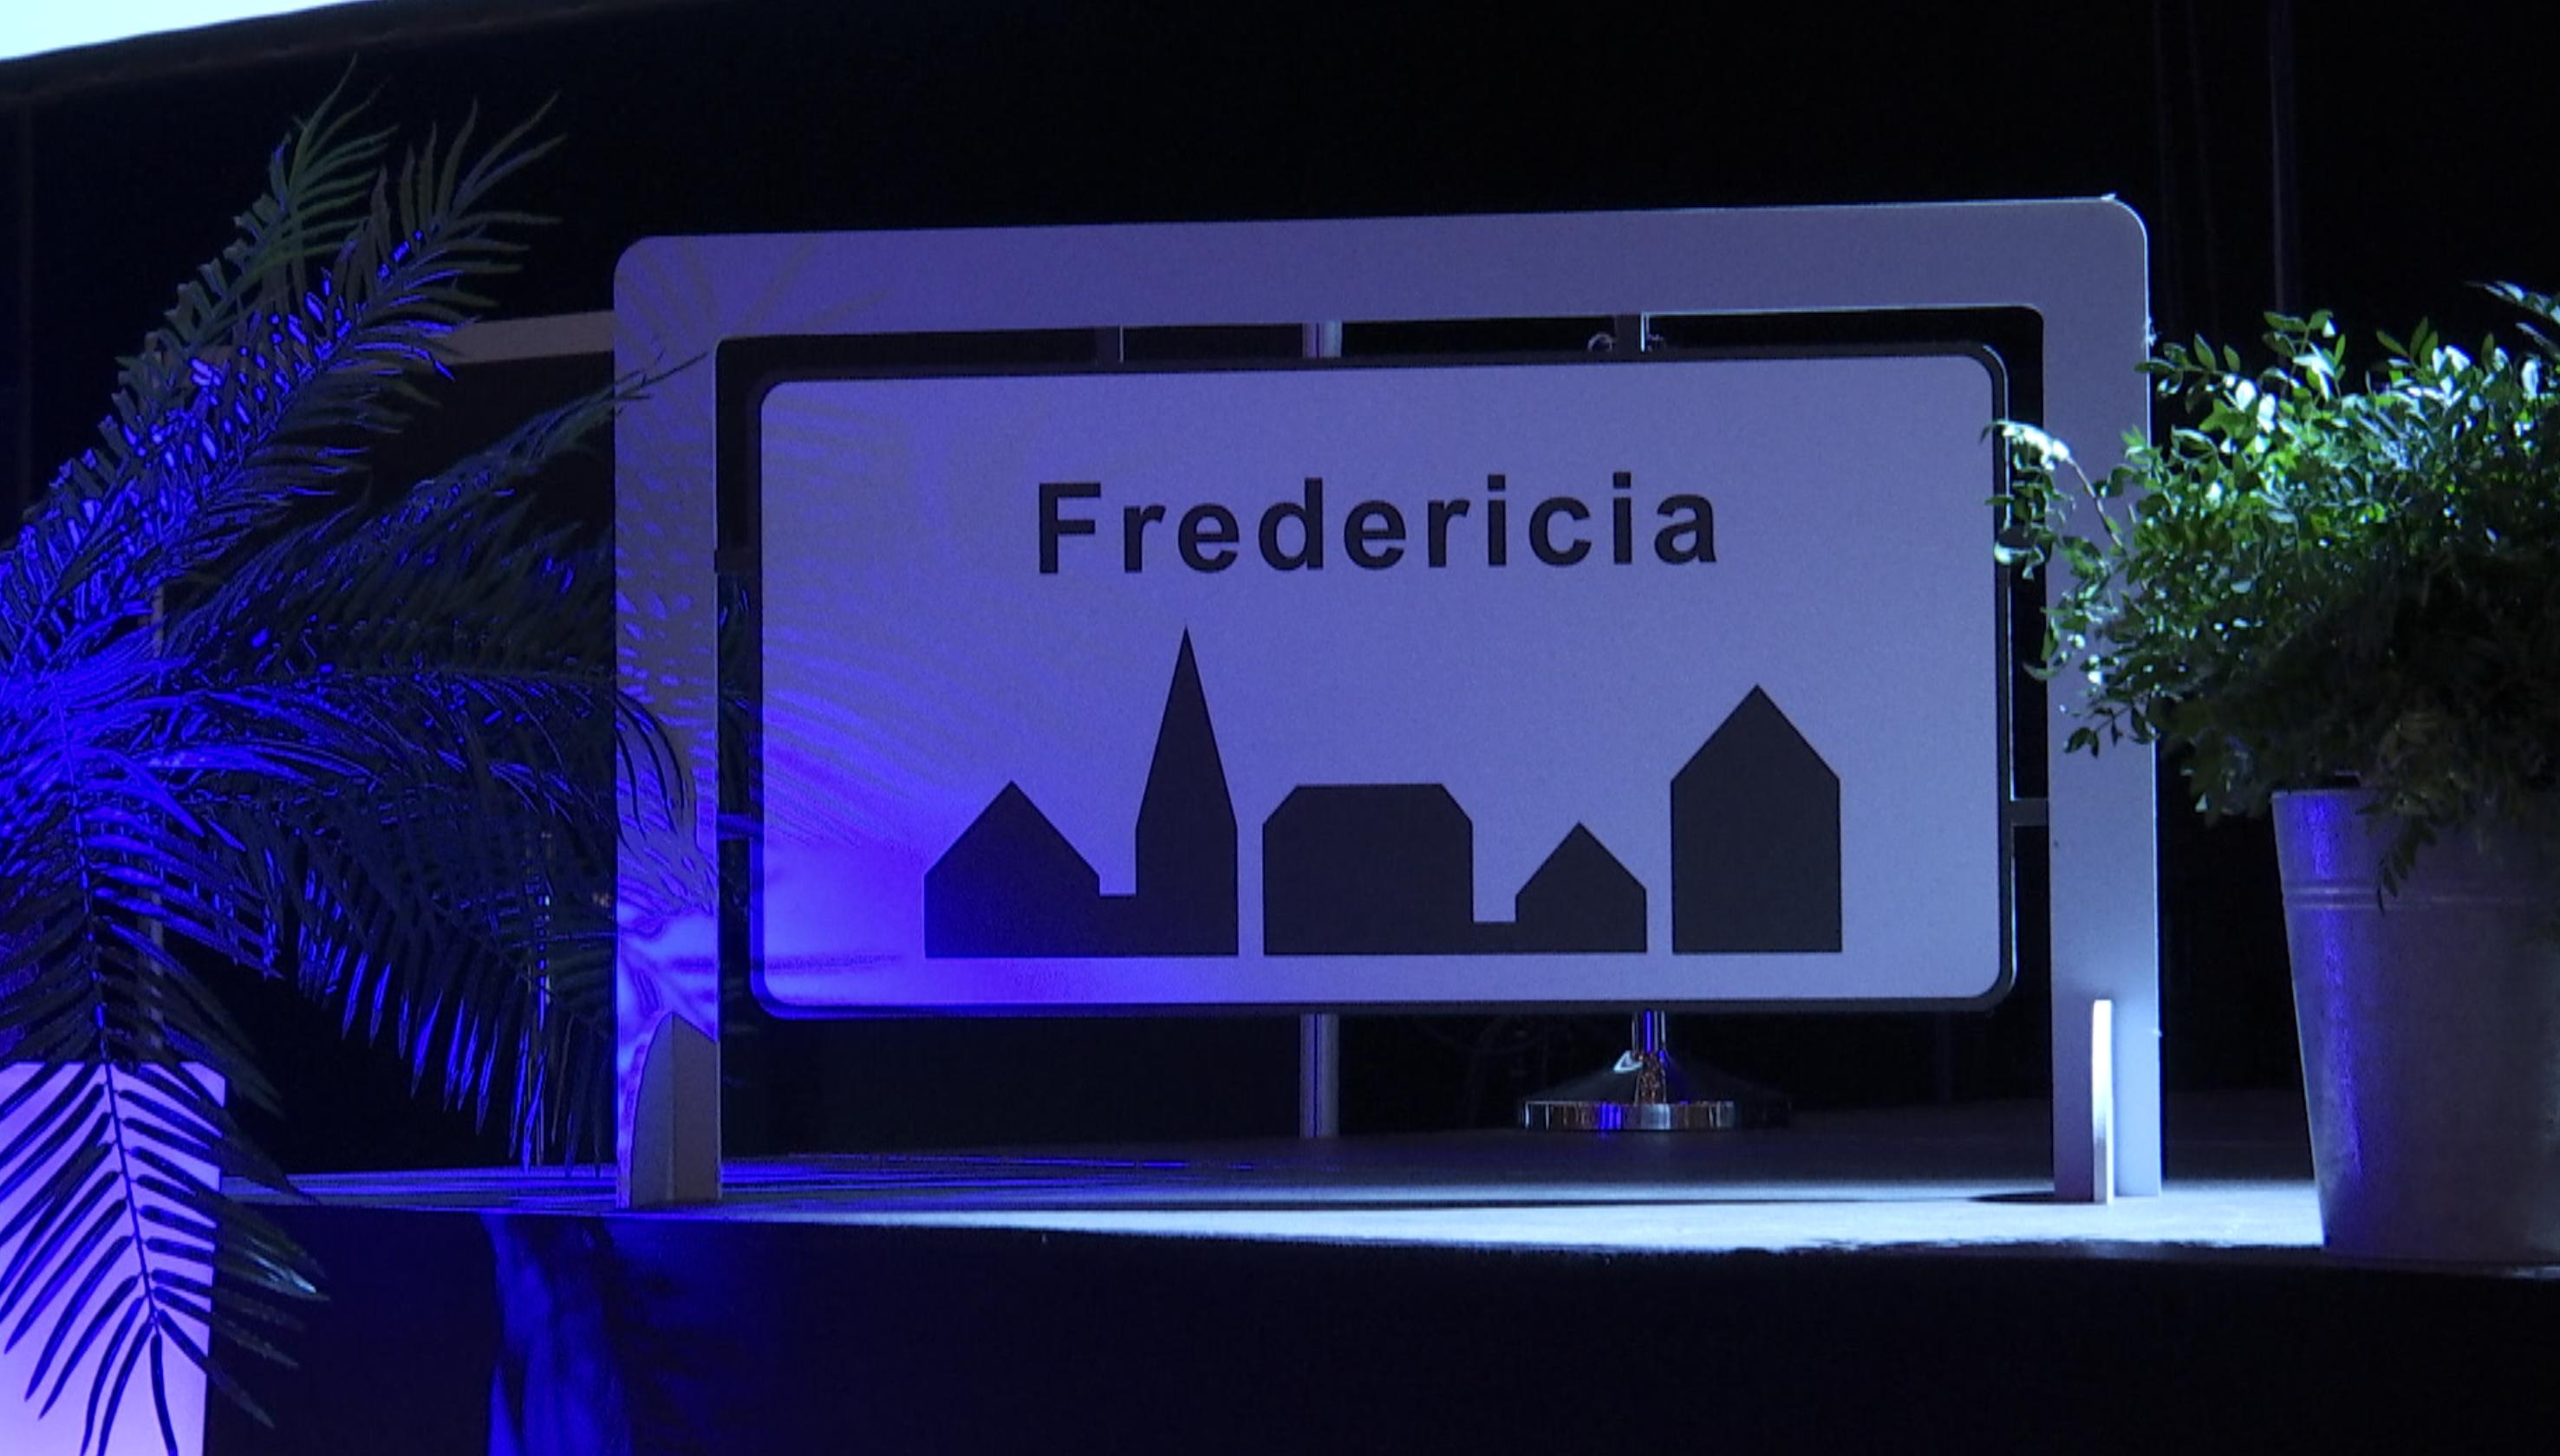 Første grundlovsceremoni i Fredericia